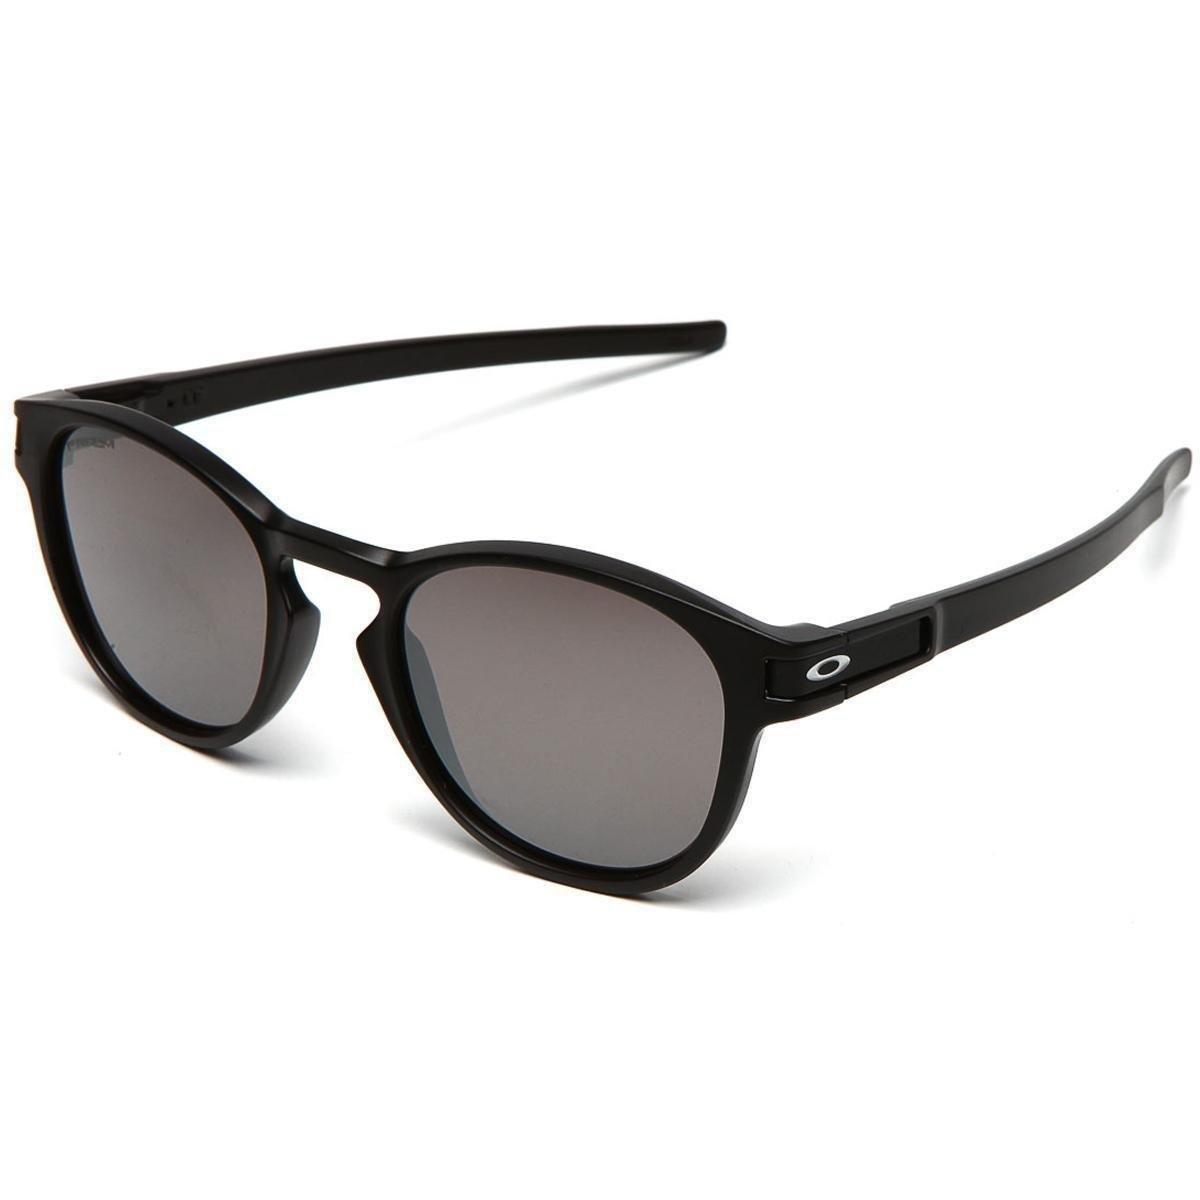 Óculos de Sol Oakley Latch M. Prizm Iridium Masculino - Preto ... 6a193fa6b8